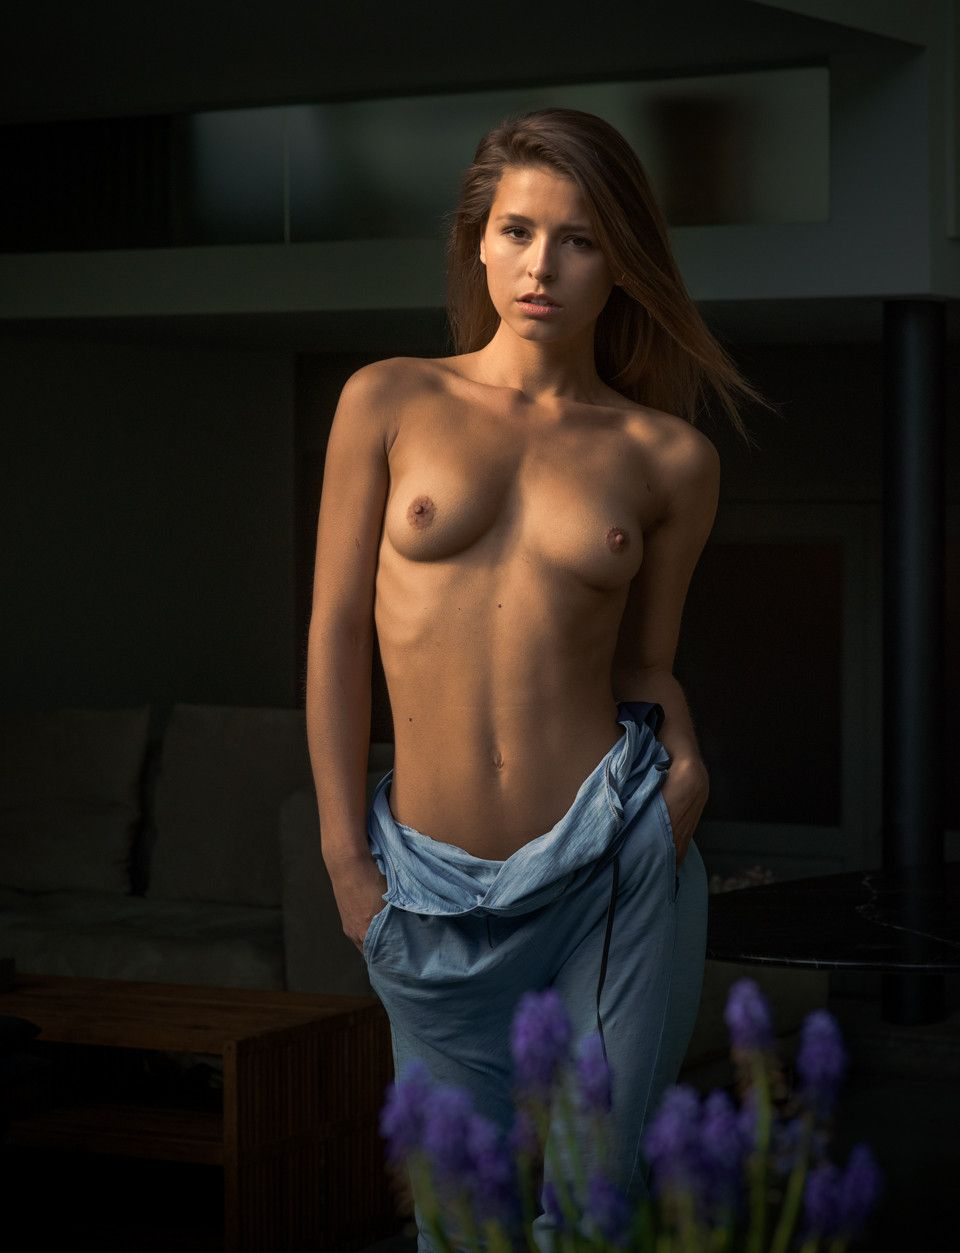 Marisa-Papen-Topless-72